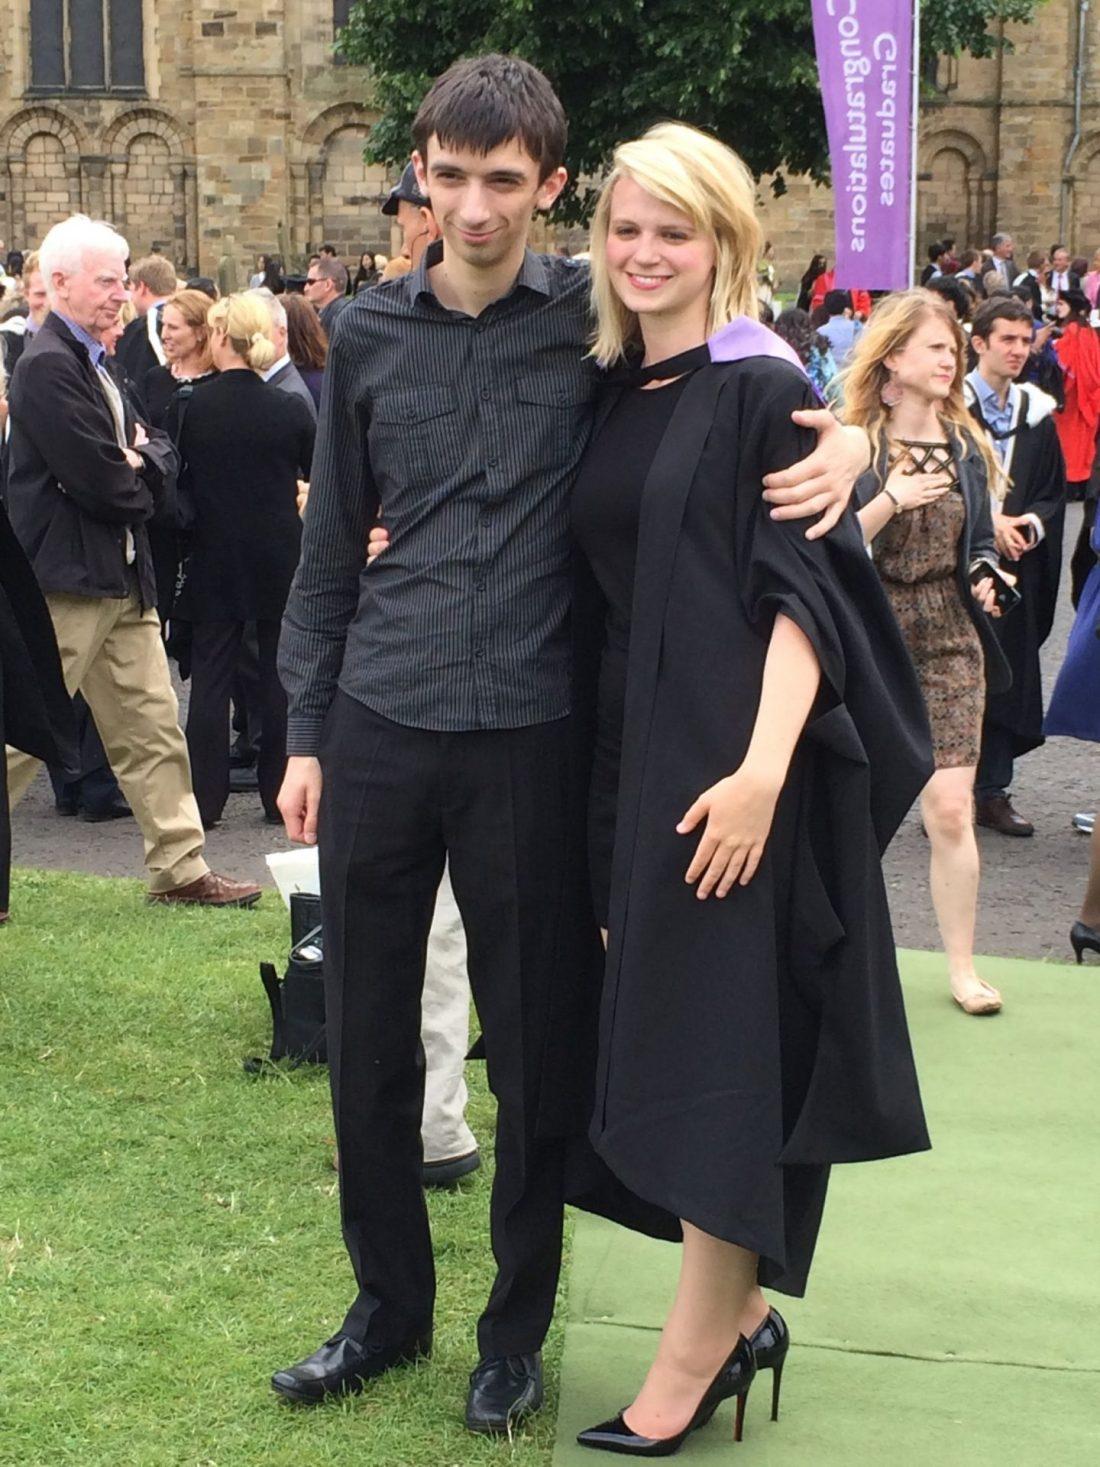 A Durham Graduation